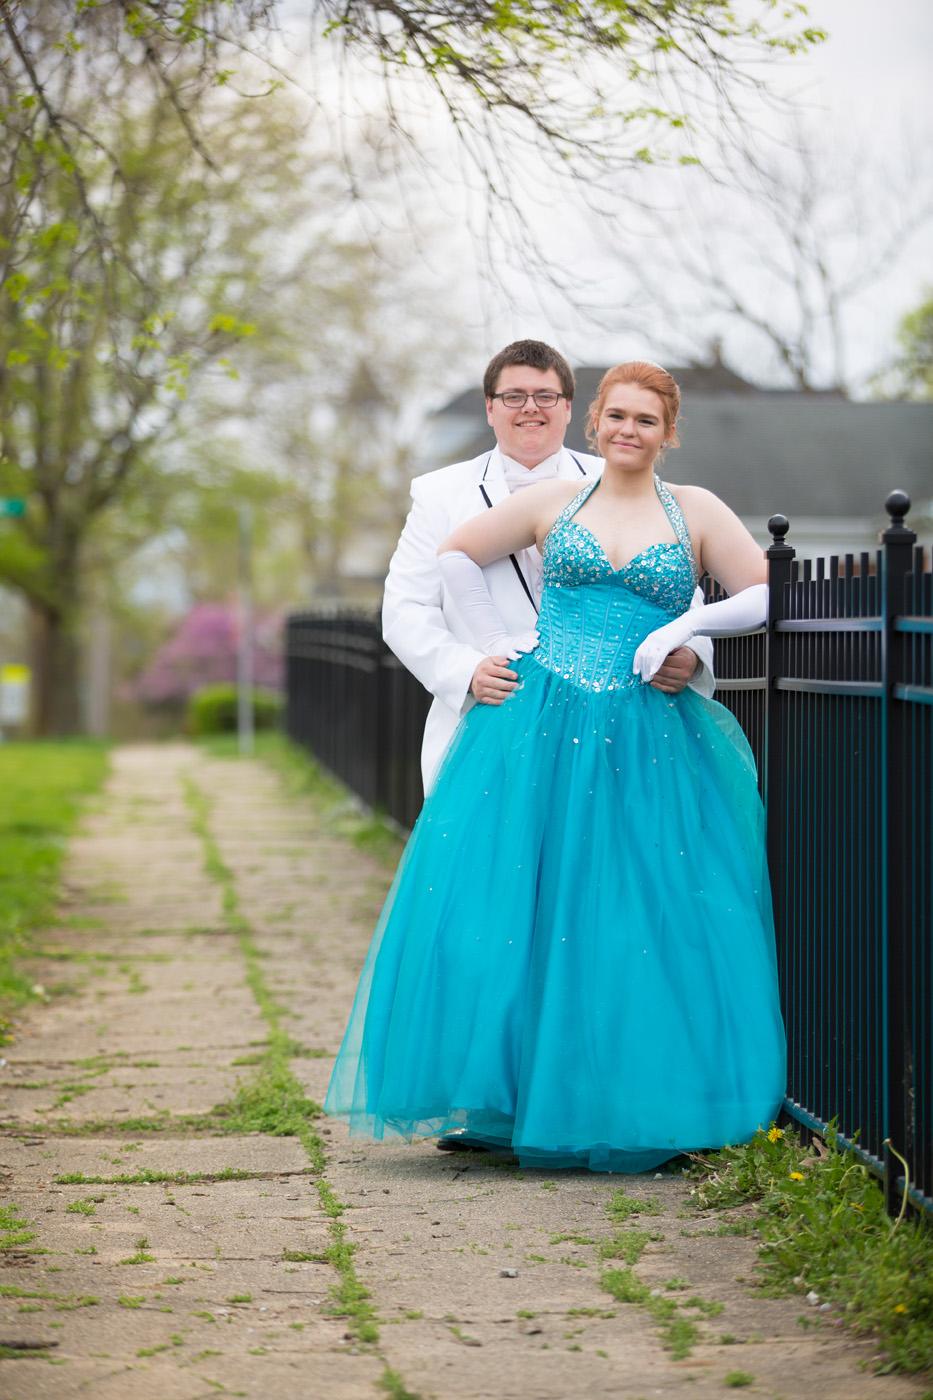 Garrett & Helen Prom 2014 115.jpg